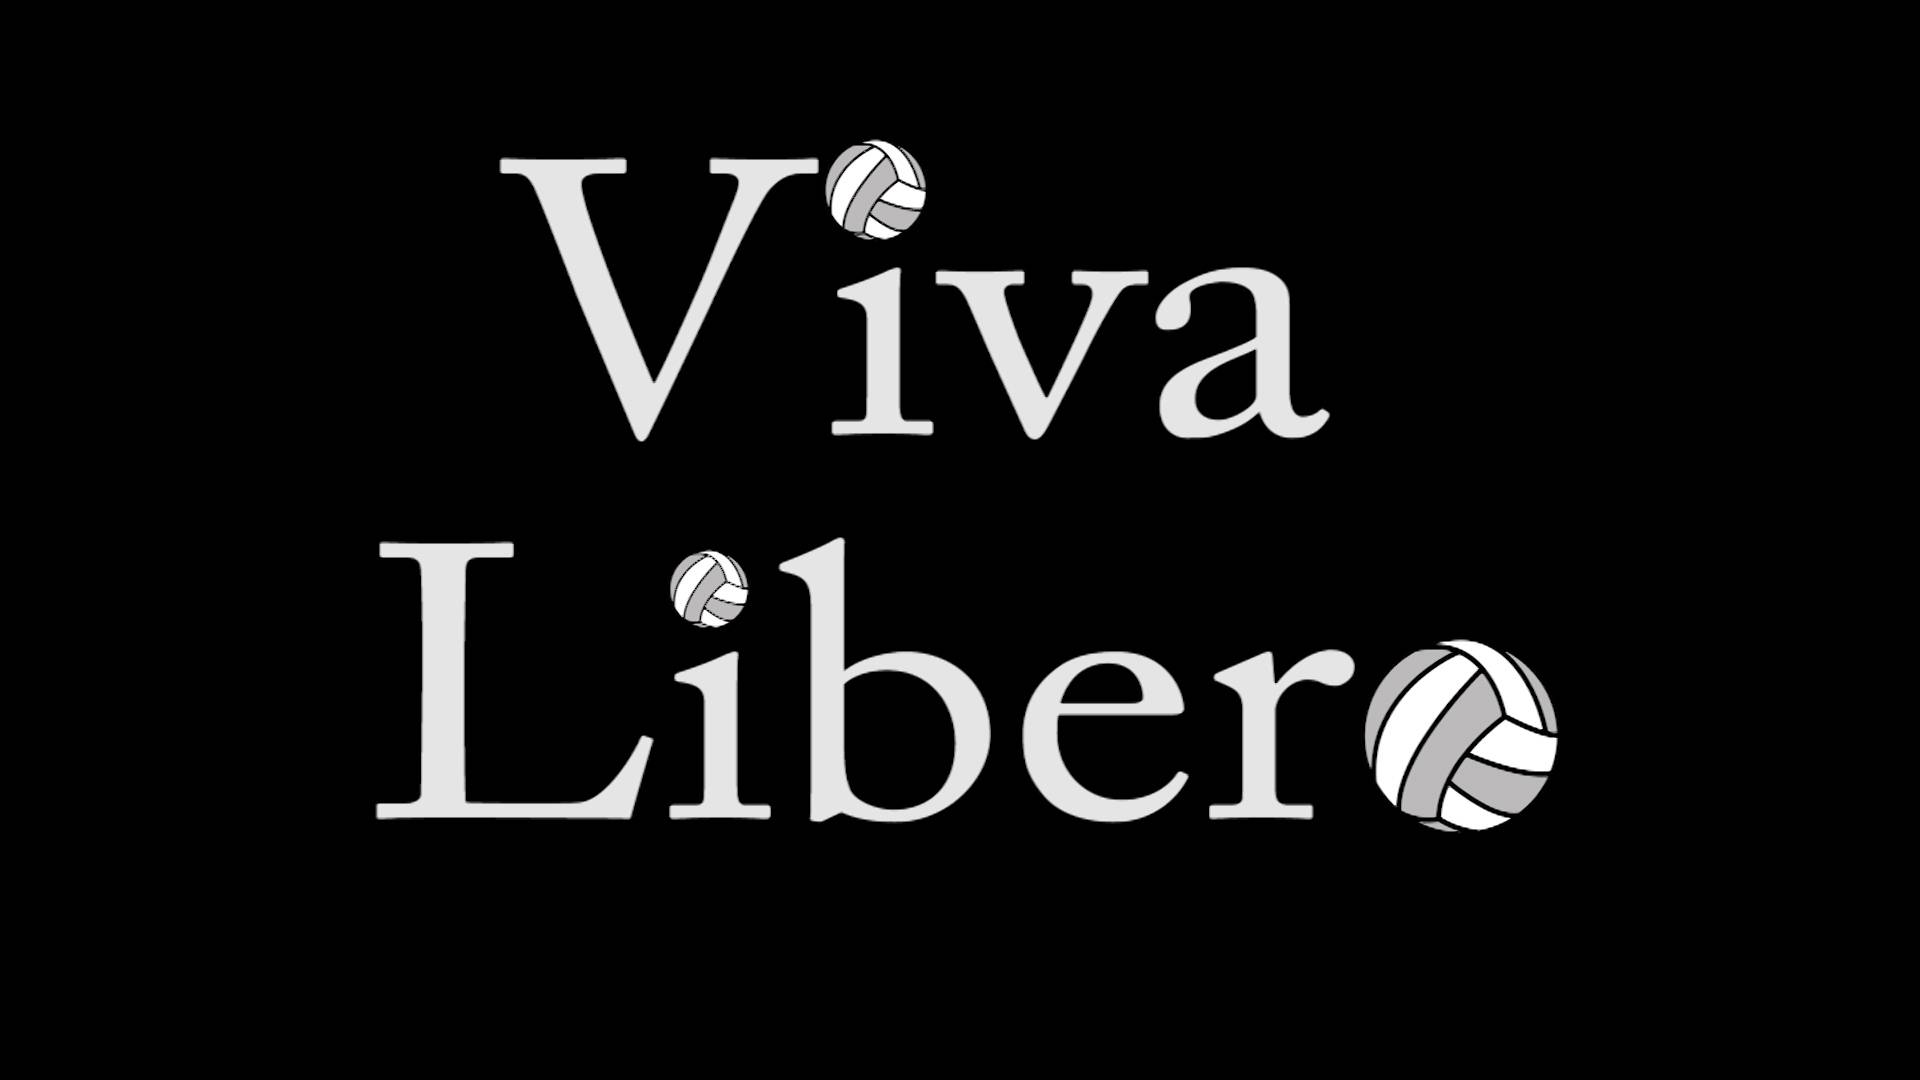 Viva Libero graphic